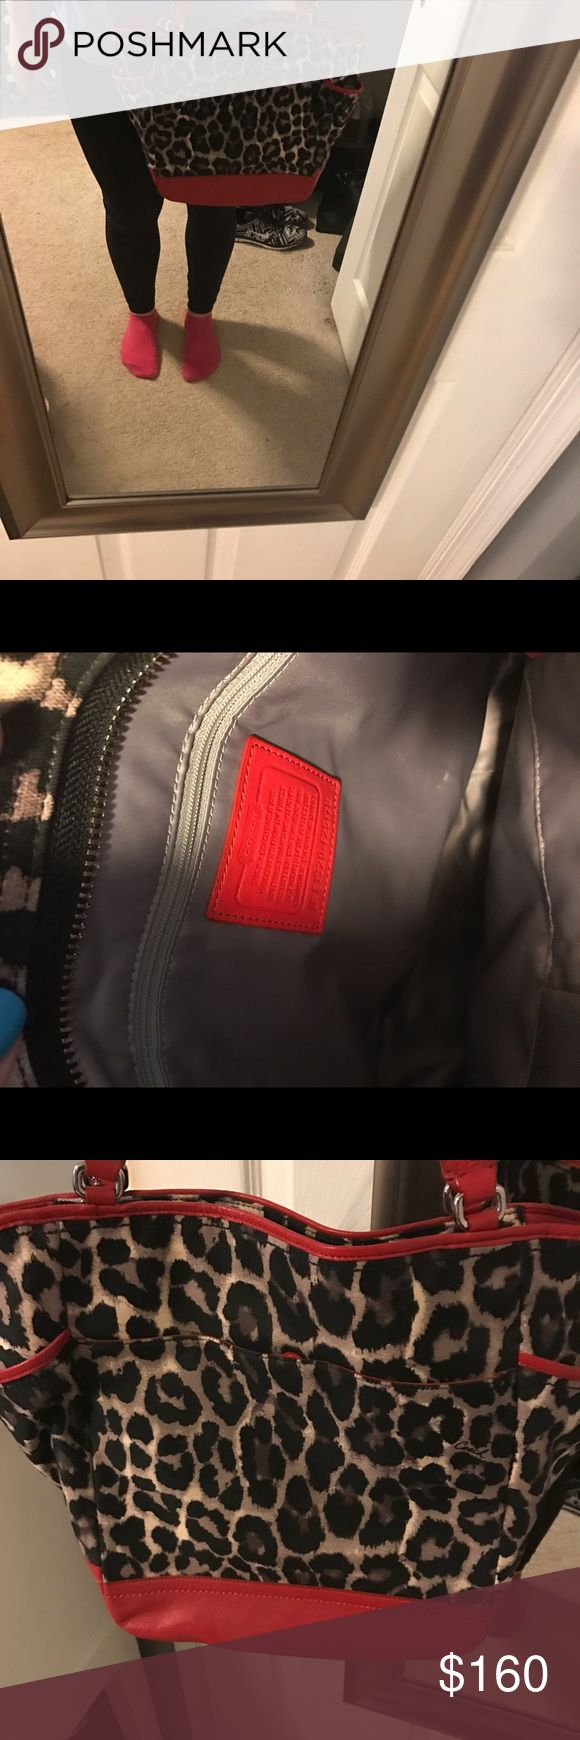 Coach tote bag In EUC Coach tote bag Coach Bags Totes